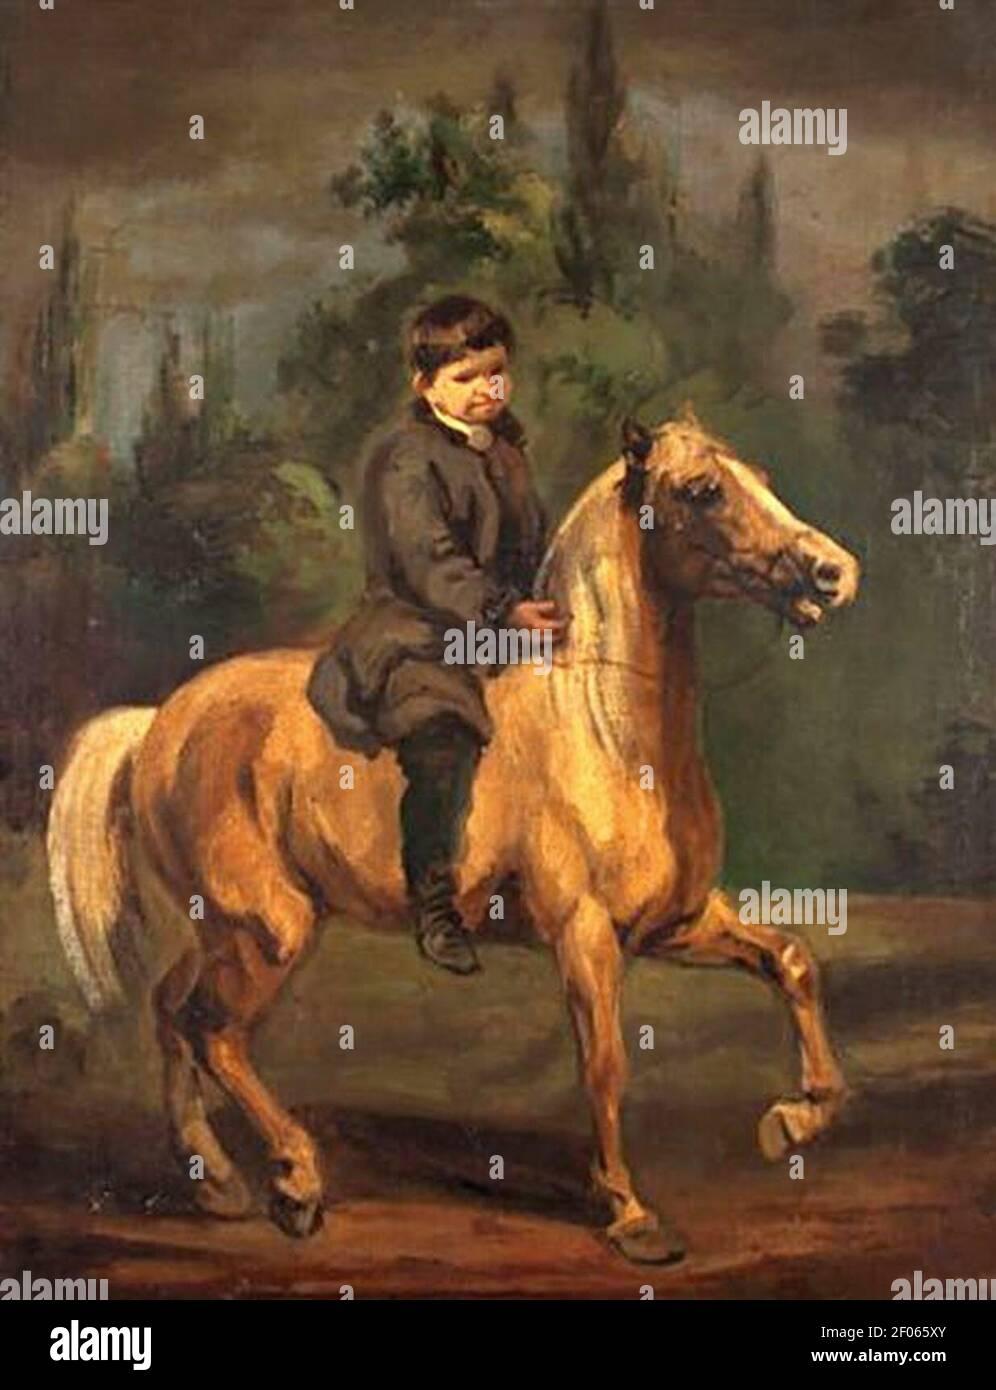 Piotr Michałowski - Chłopiec na koniu. Foto de stock